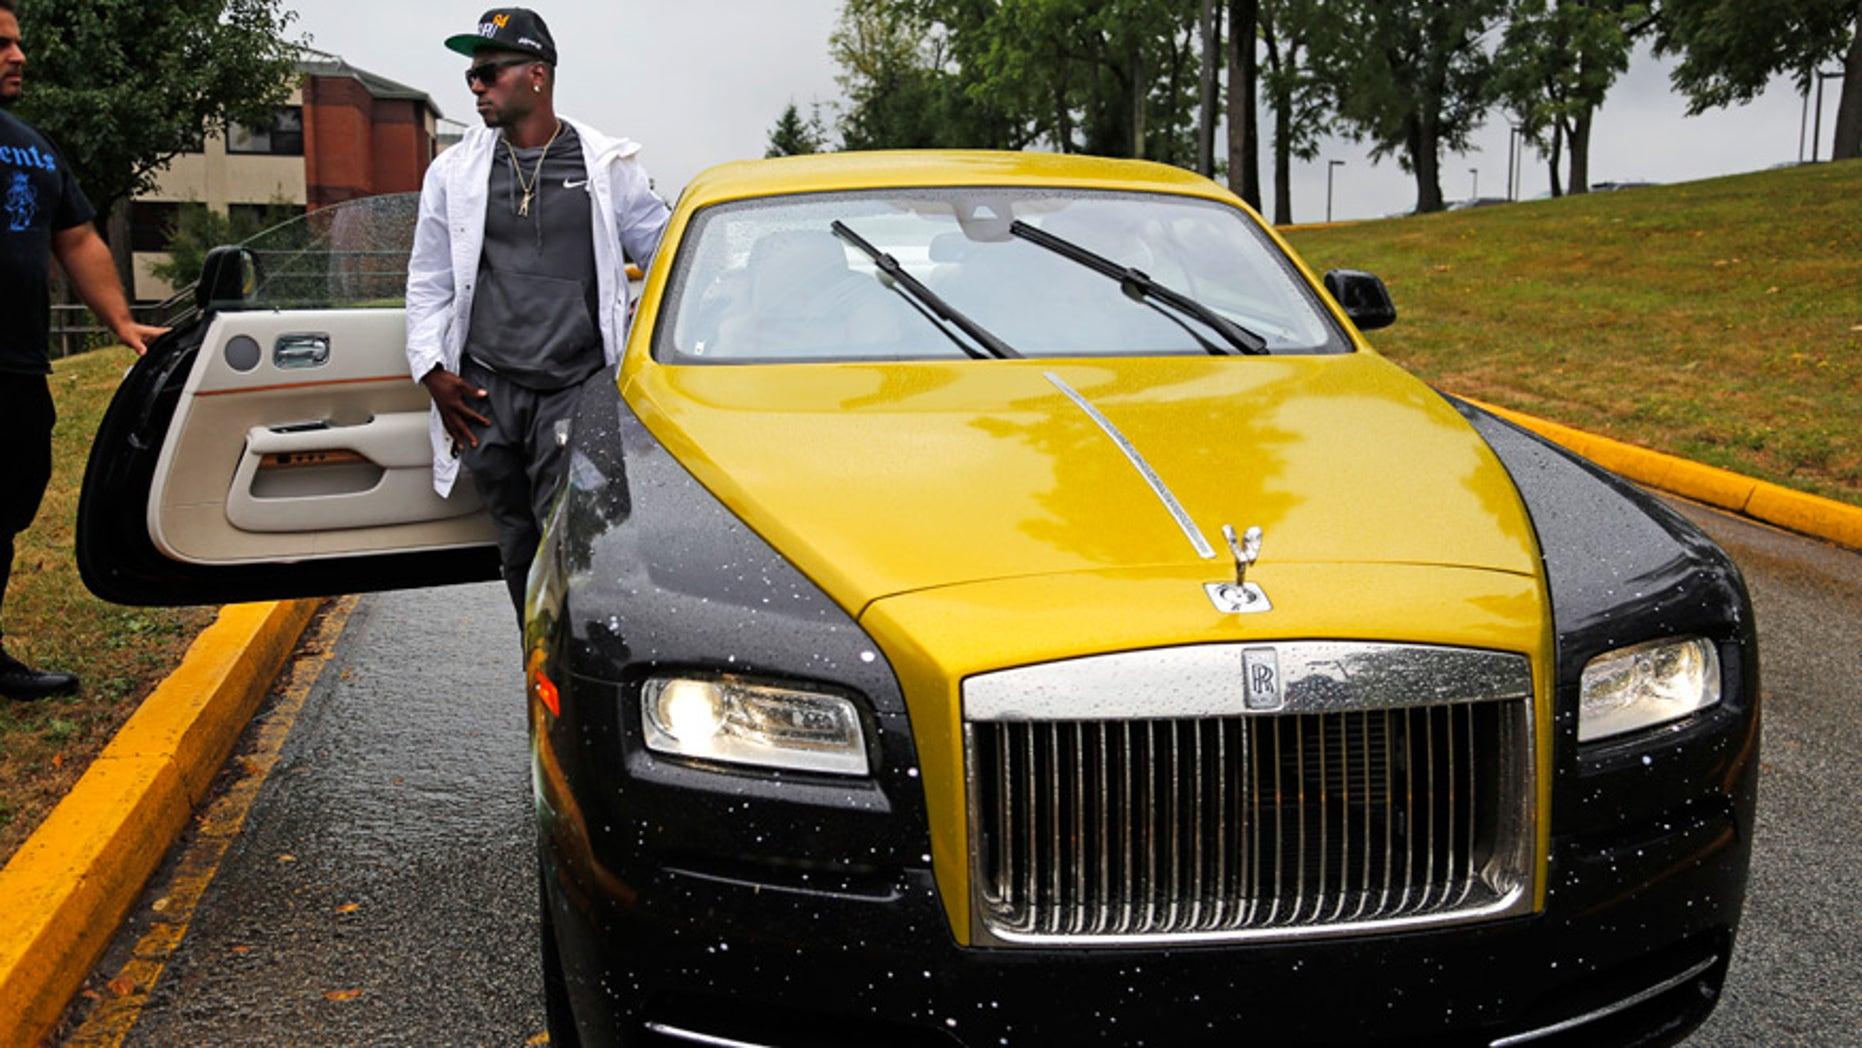 super popular 5ff7e a3566 Antonio Brown unveils $300,000 Steelers-themed Rolls Royce ...